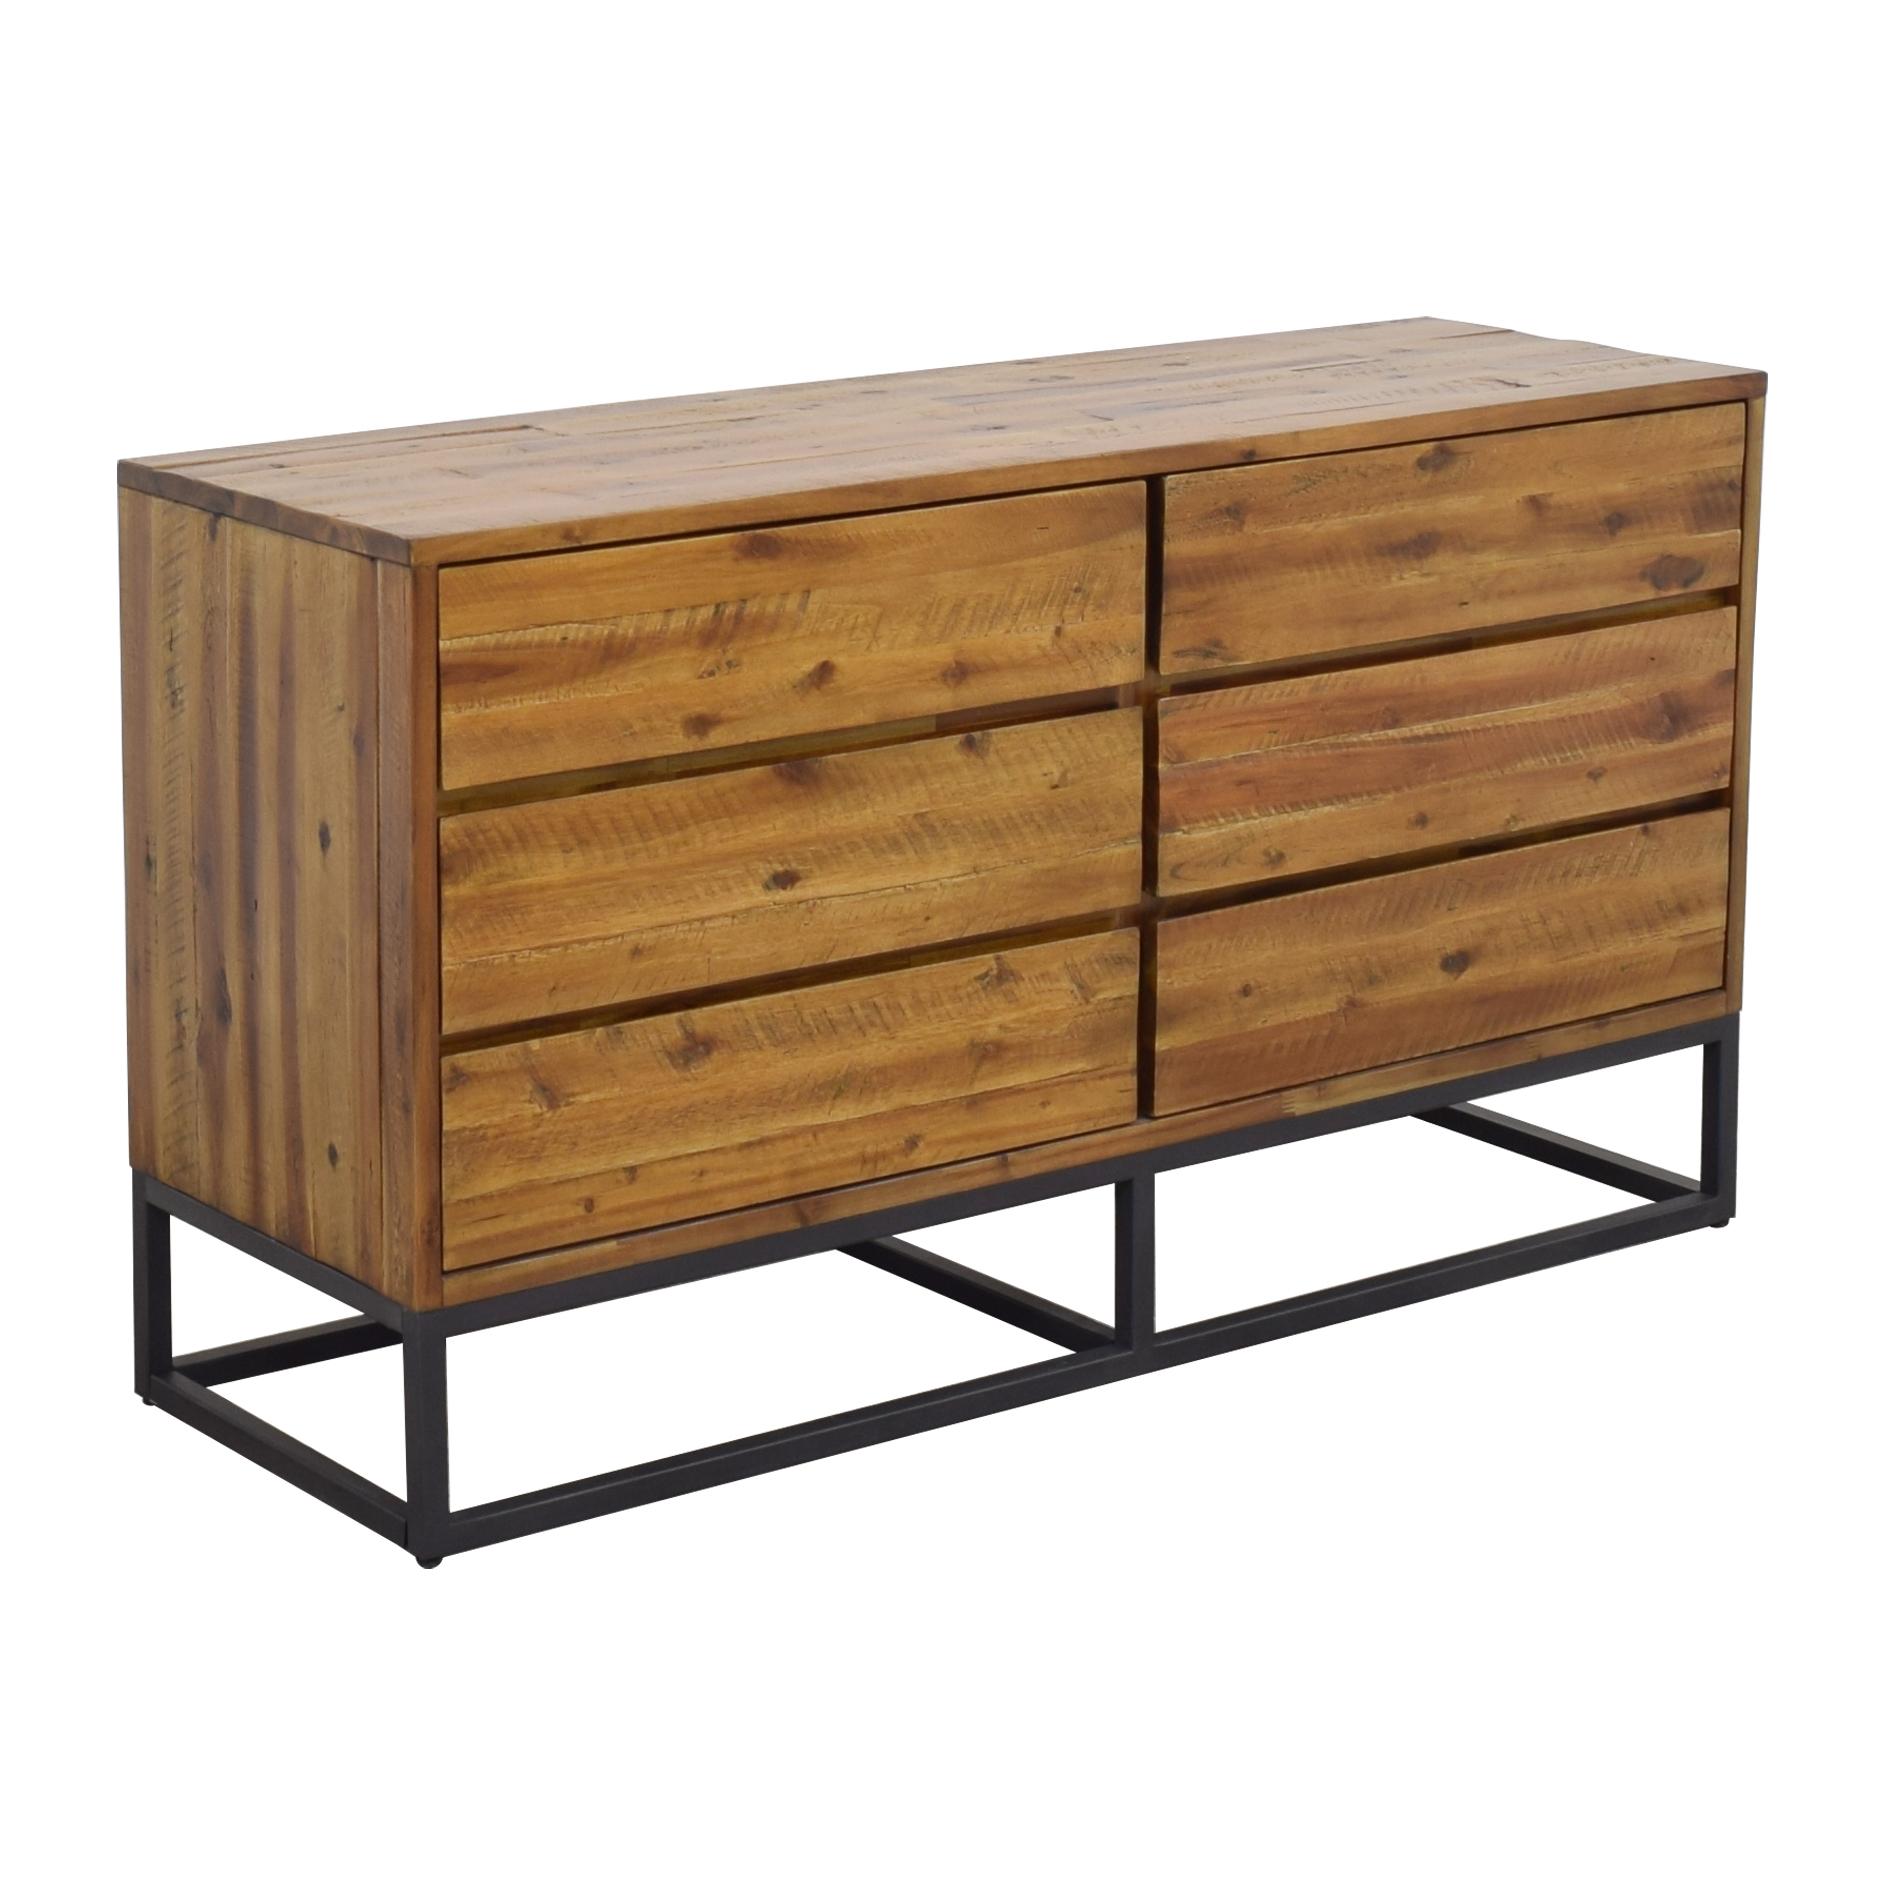 West Elm West Elm Logan Industrial 6-Drawer Dresser Dressers